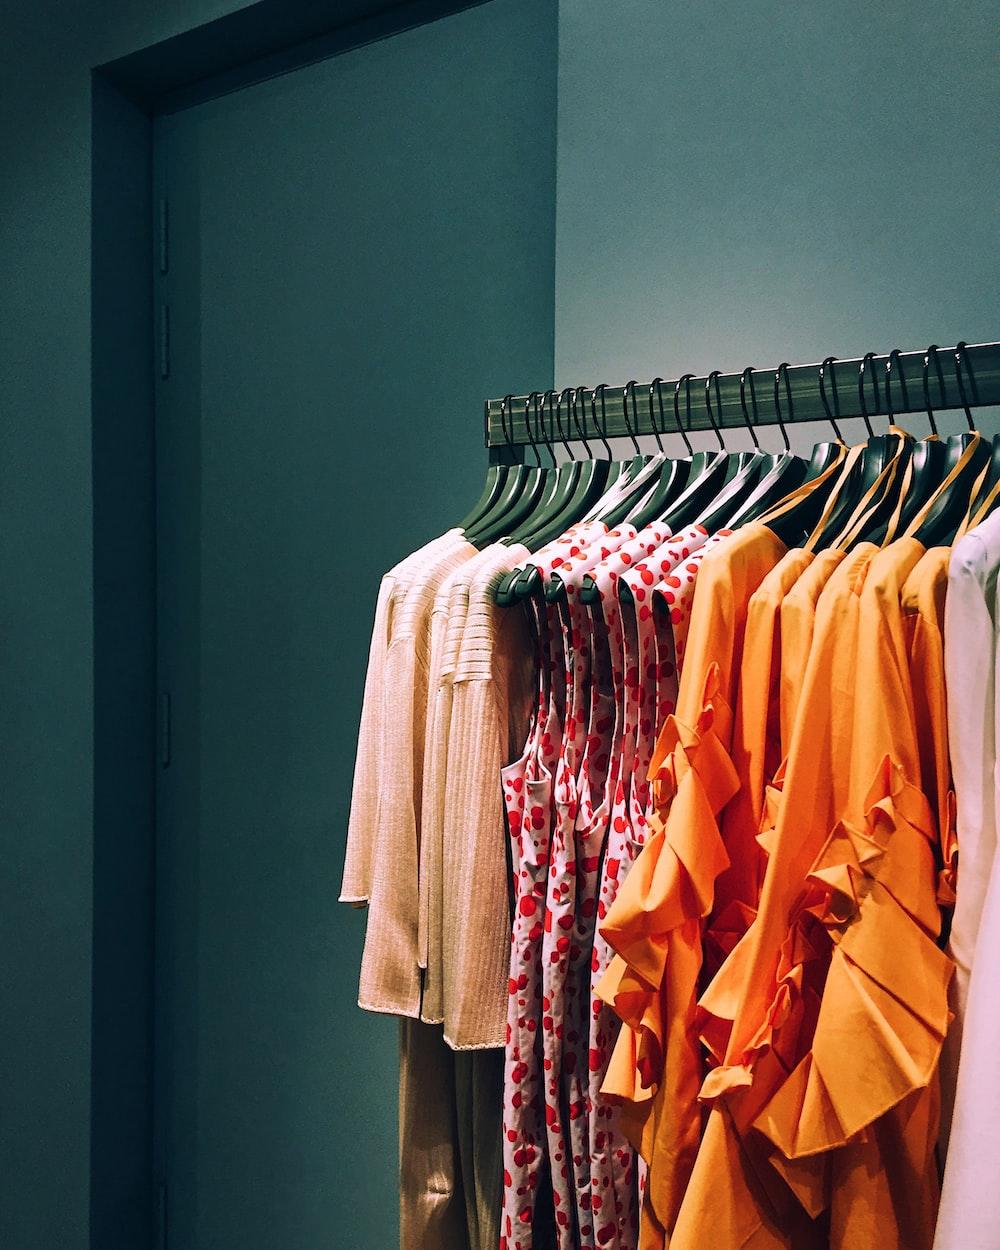 assorted-color shirt lot hang on rack